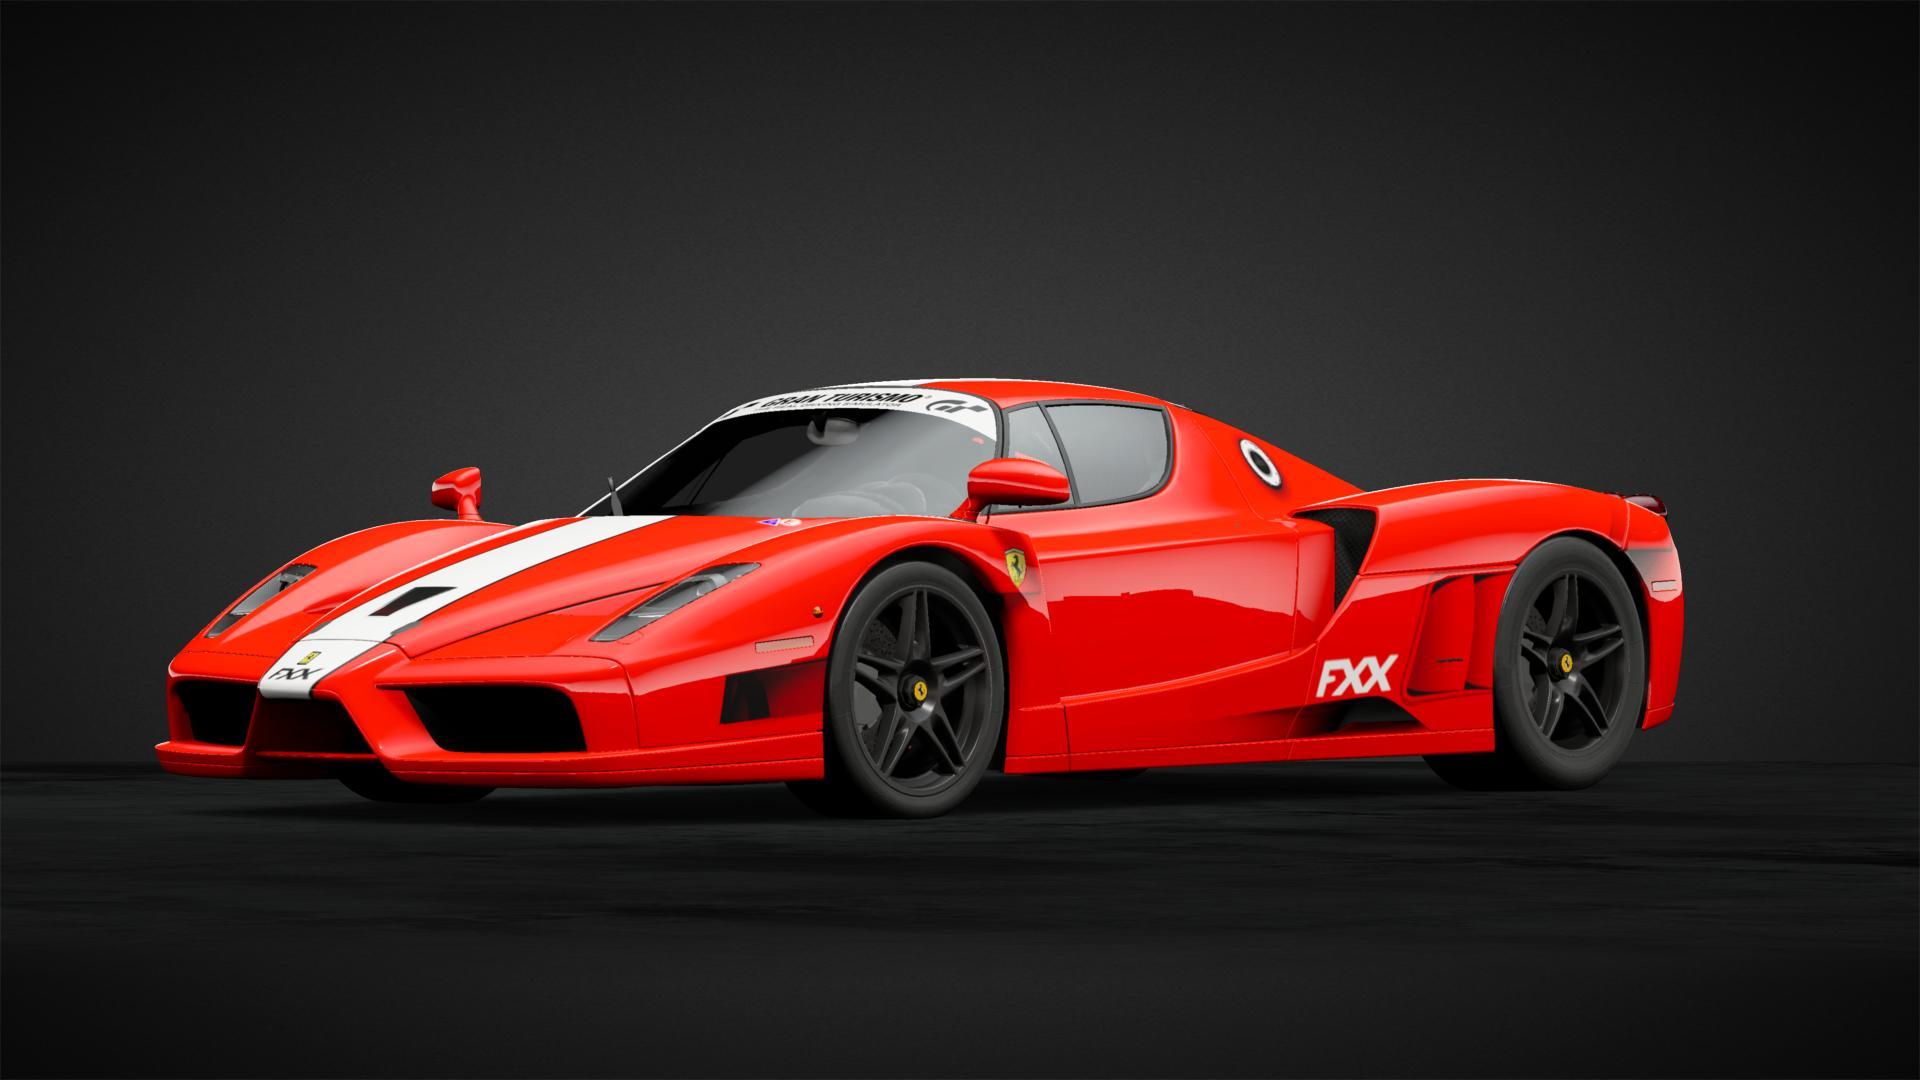 Ferrari Enzo Fxx Car Livery By Xcolomb1anx Community Gran Turismo Sport